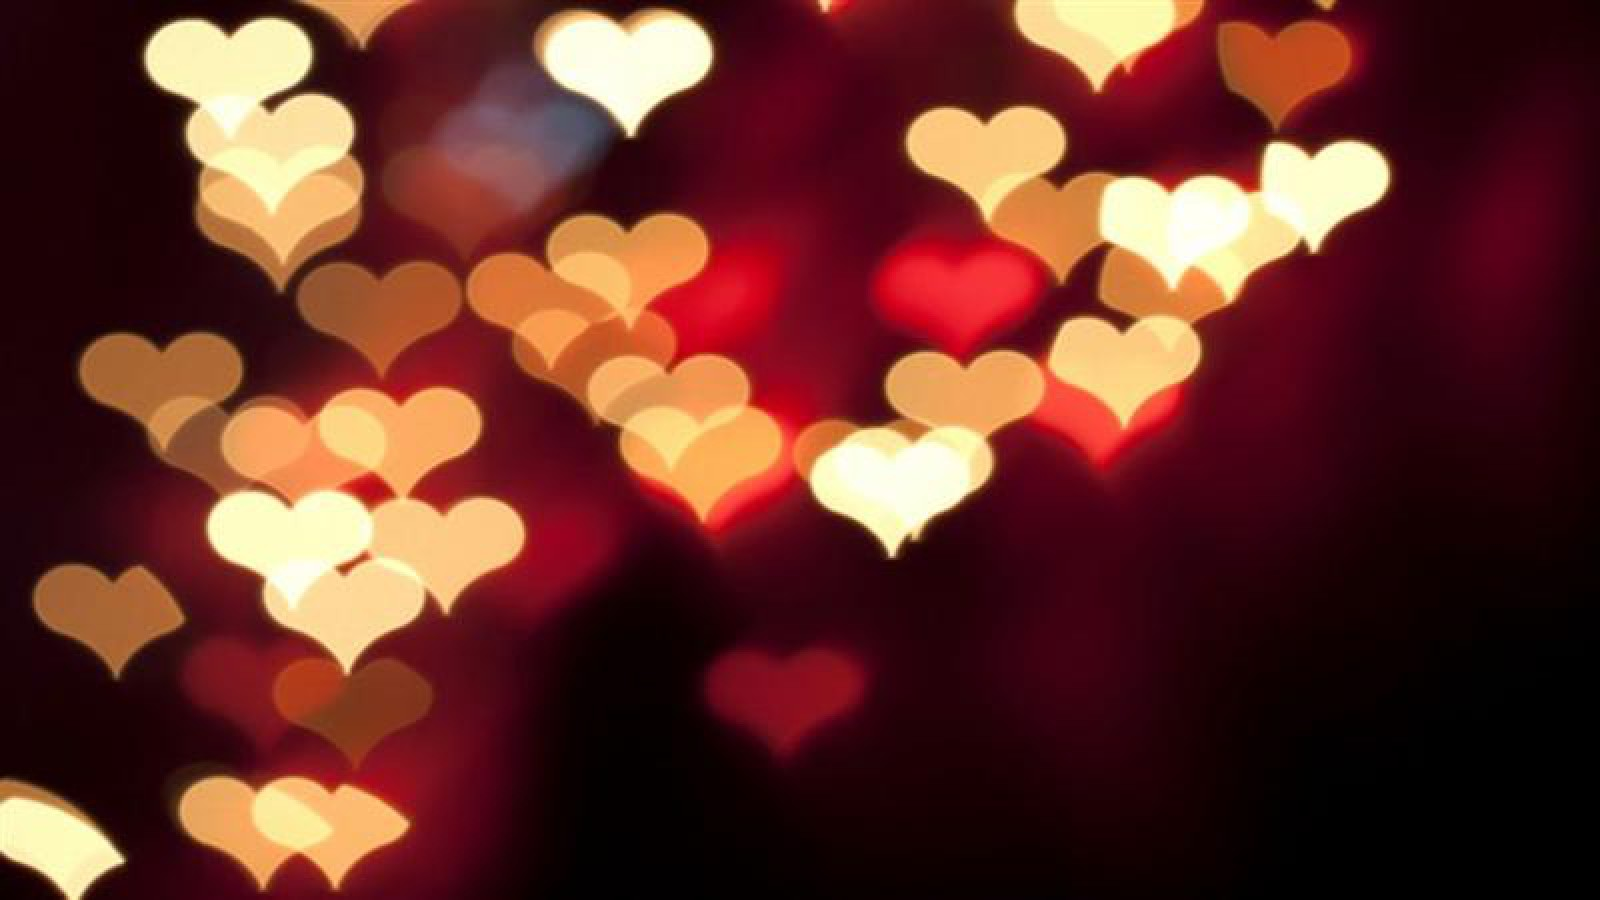 14 februarie - Sf. Valentin & Valentina; Care este legenda